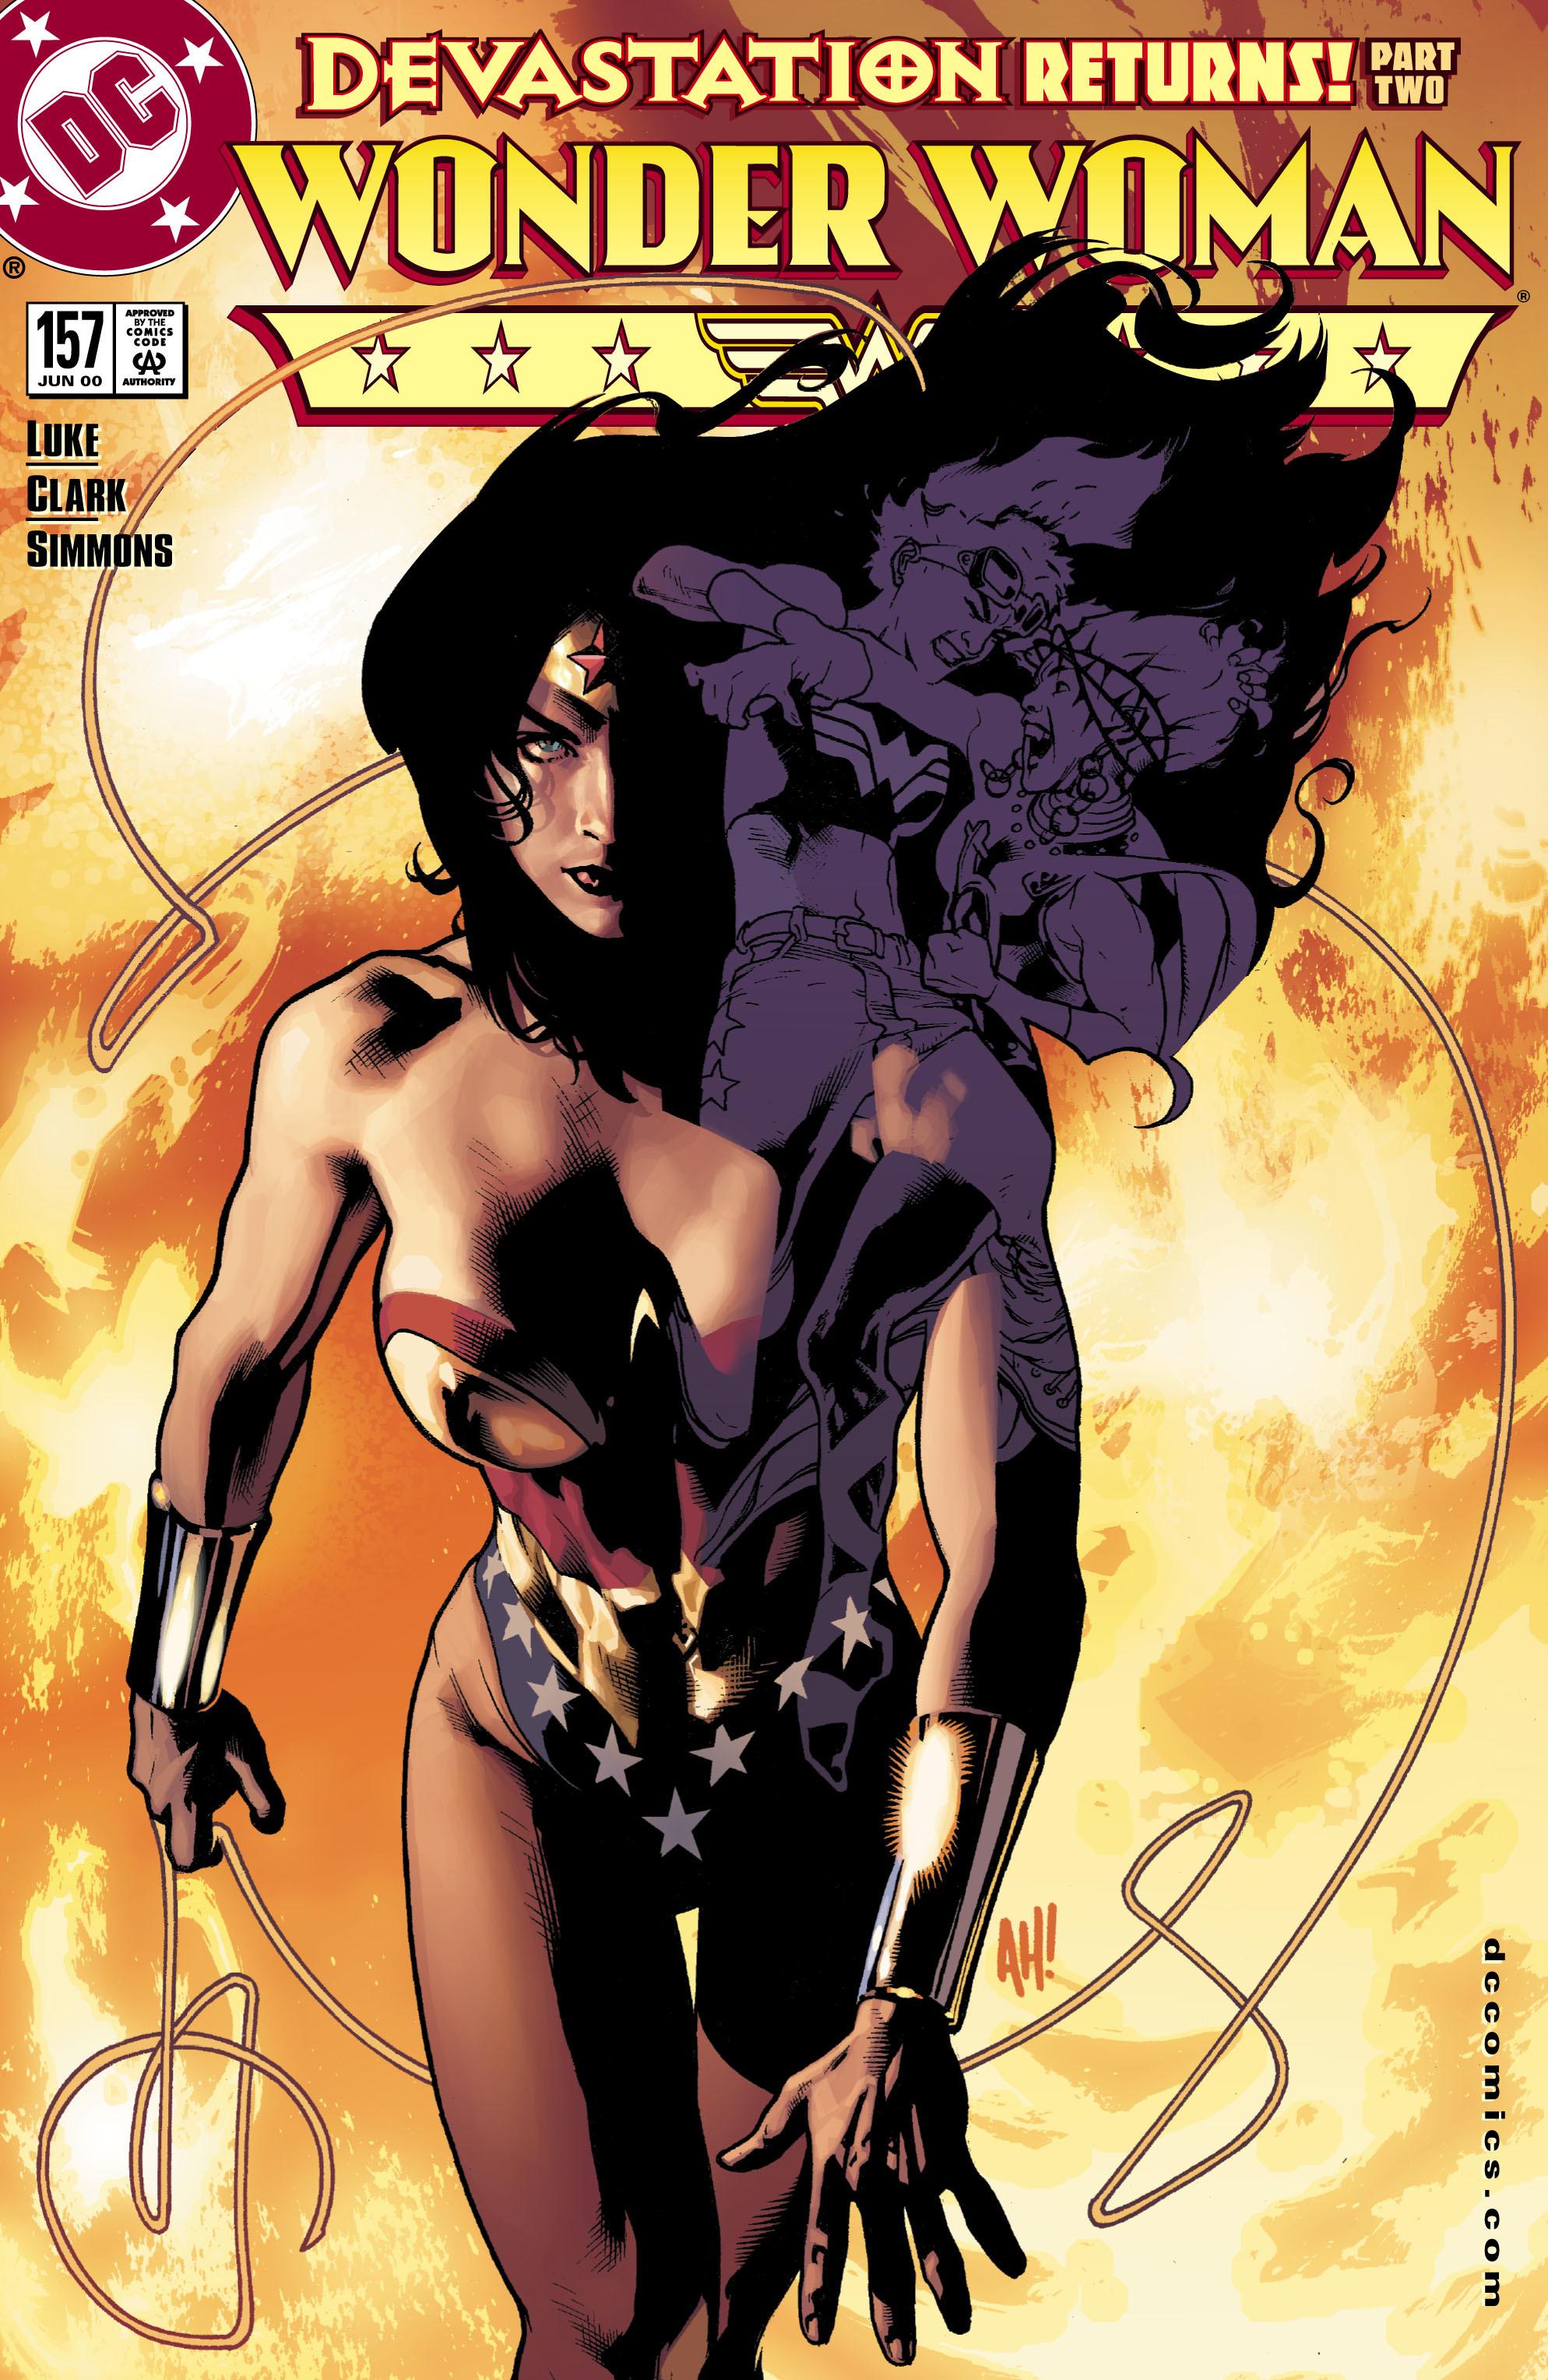 Read online Wonder Woman (1987) comic -  Issue #157 - 1